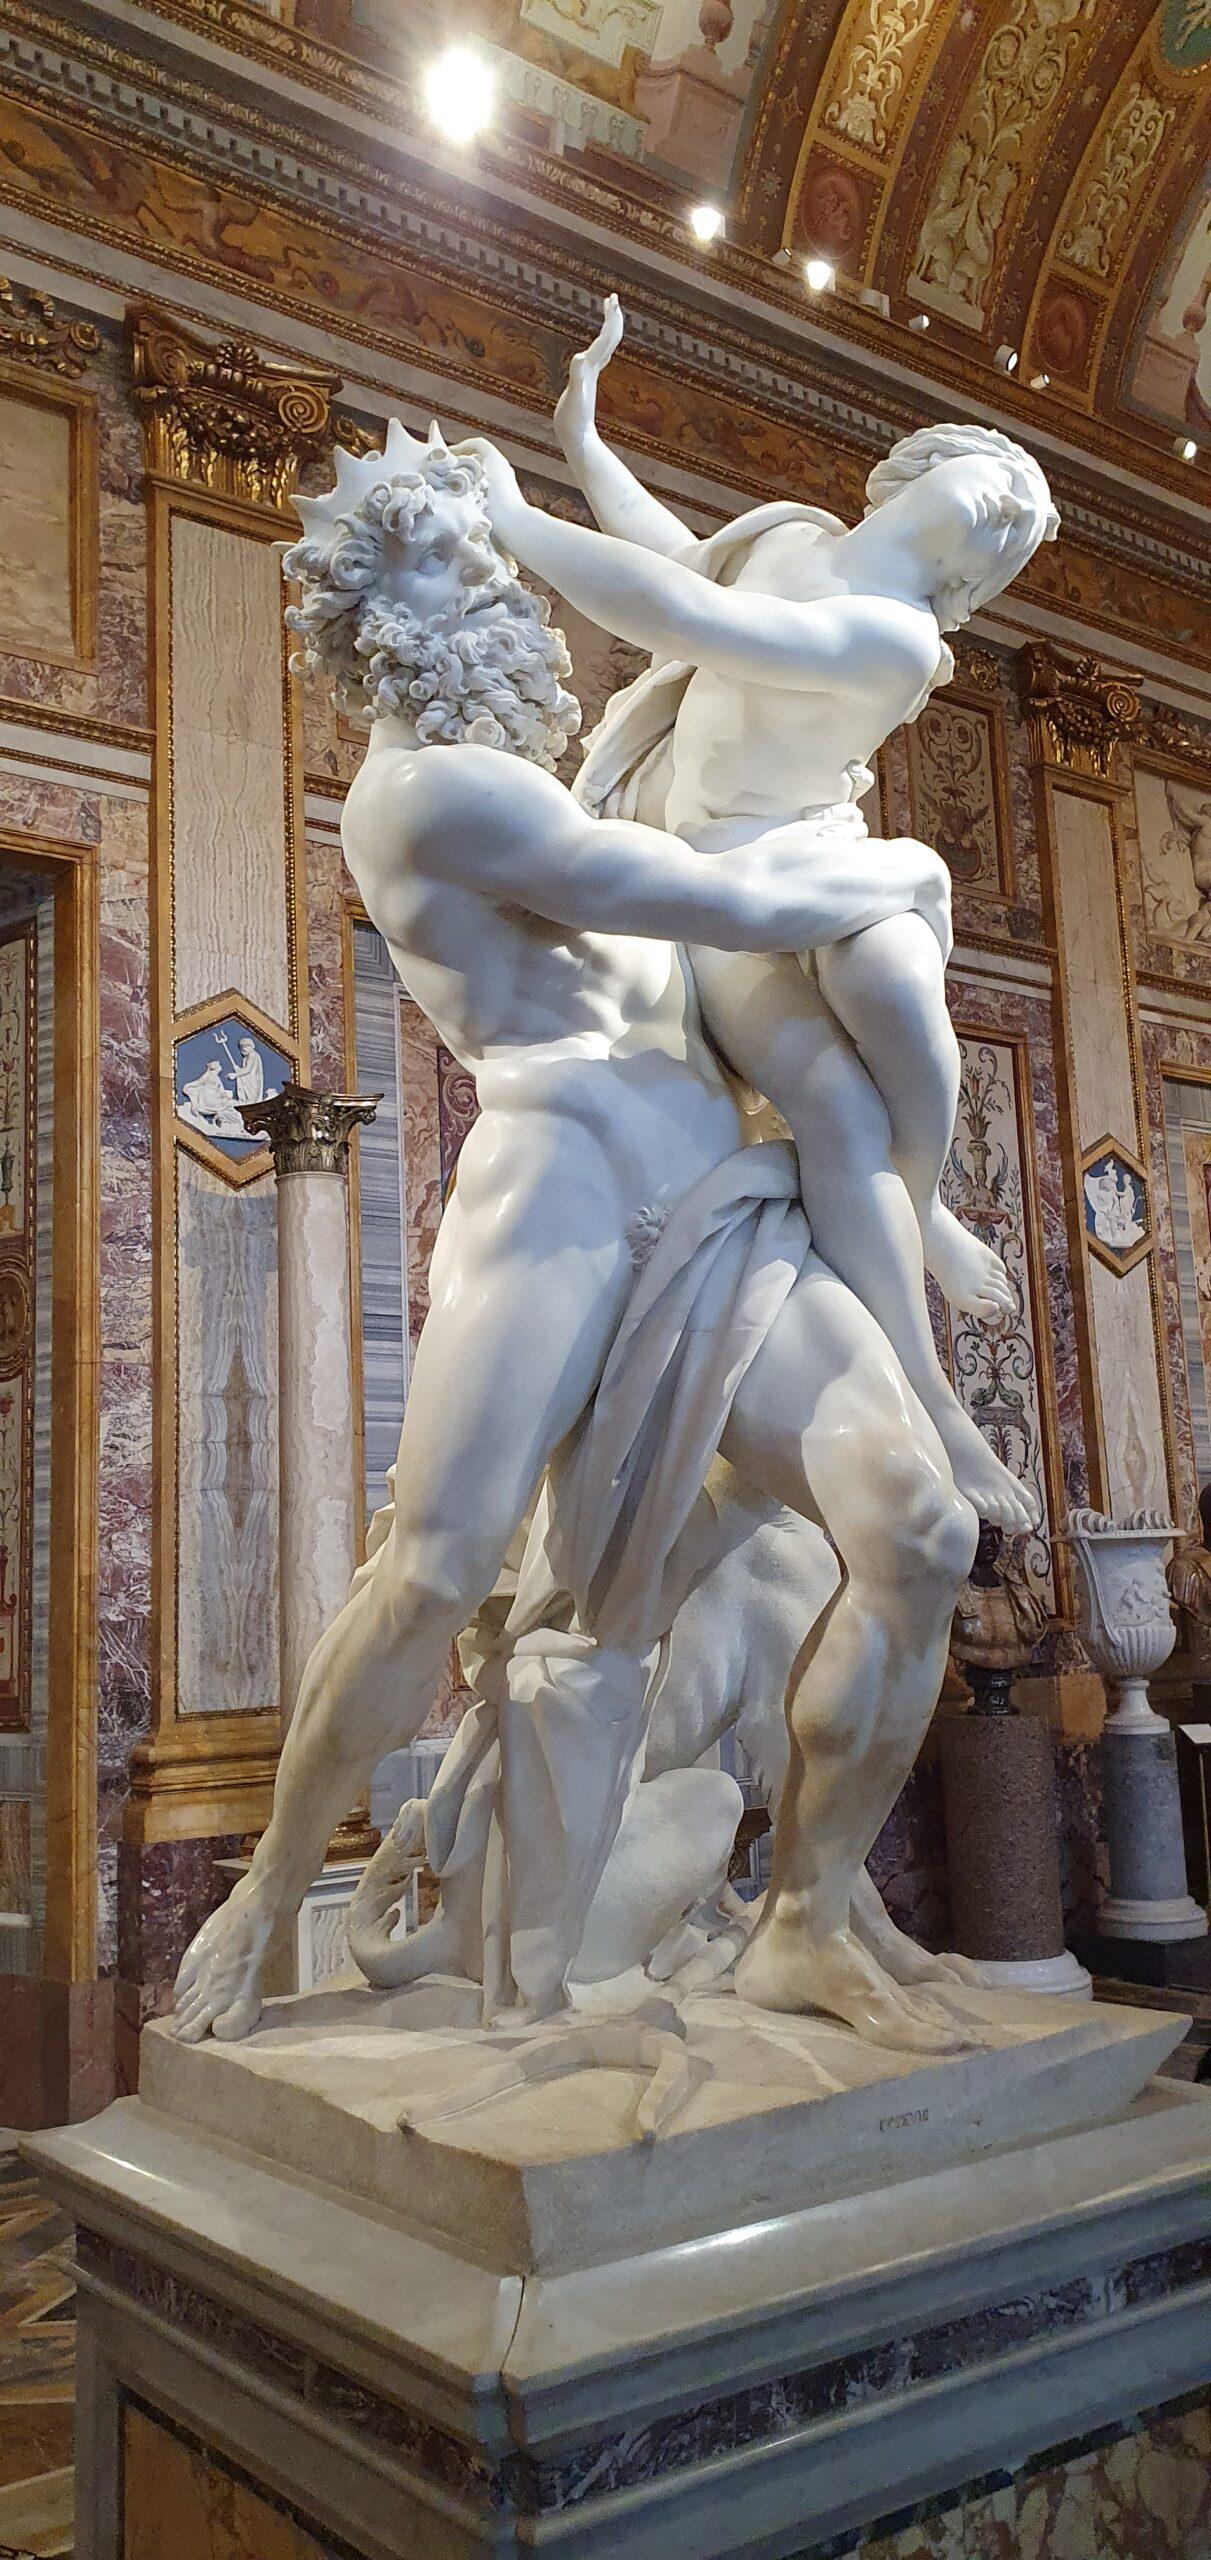 """The Rape of Proserpine"", Borghese Gallery"